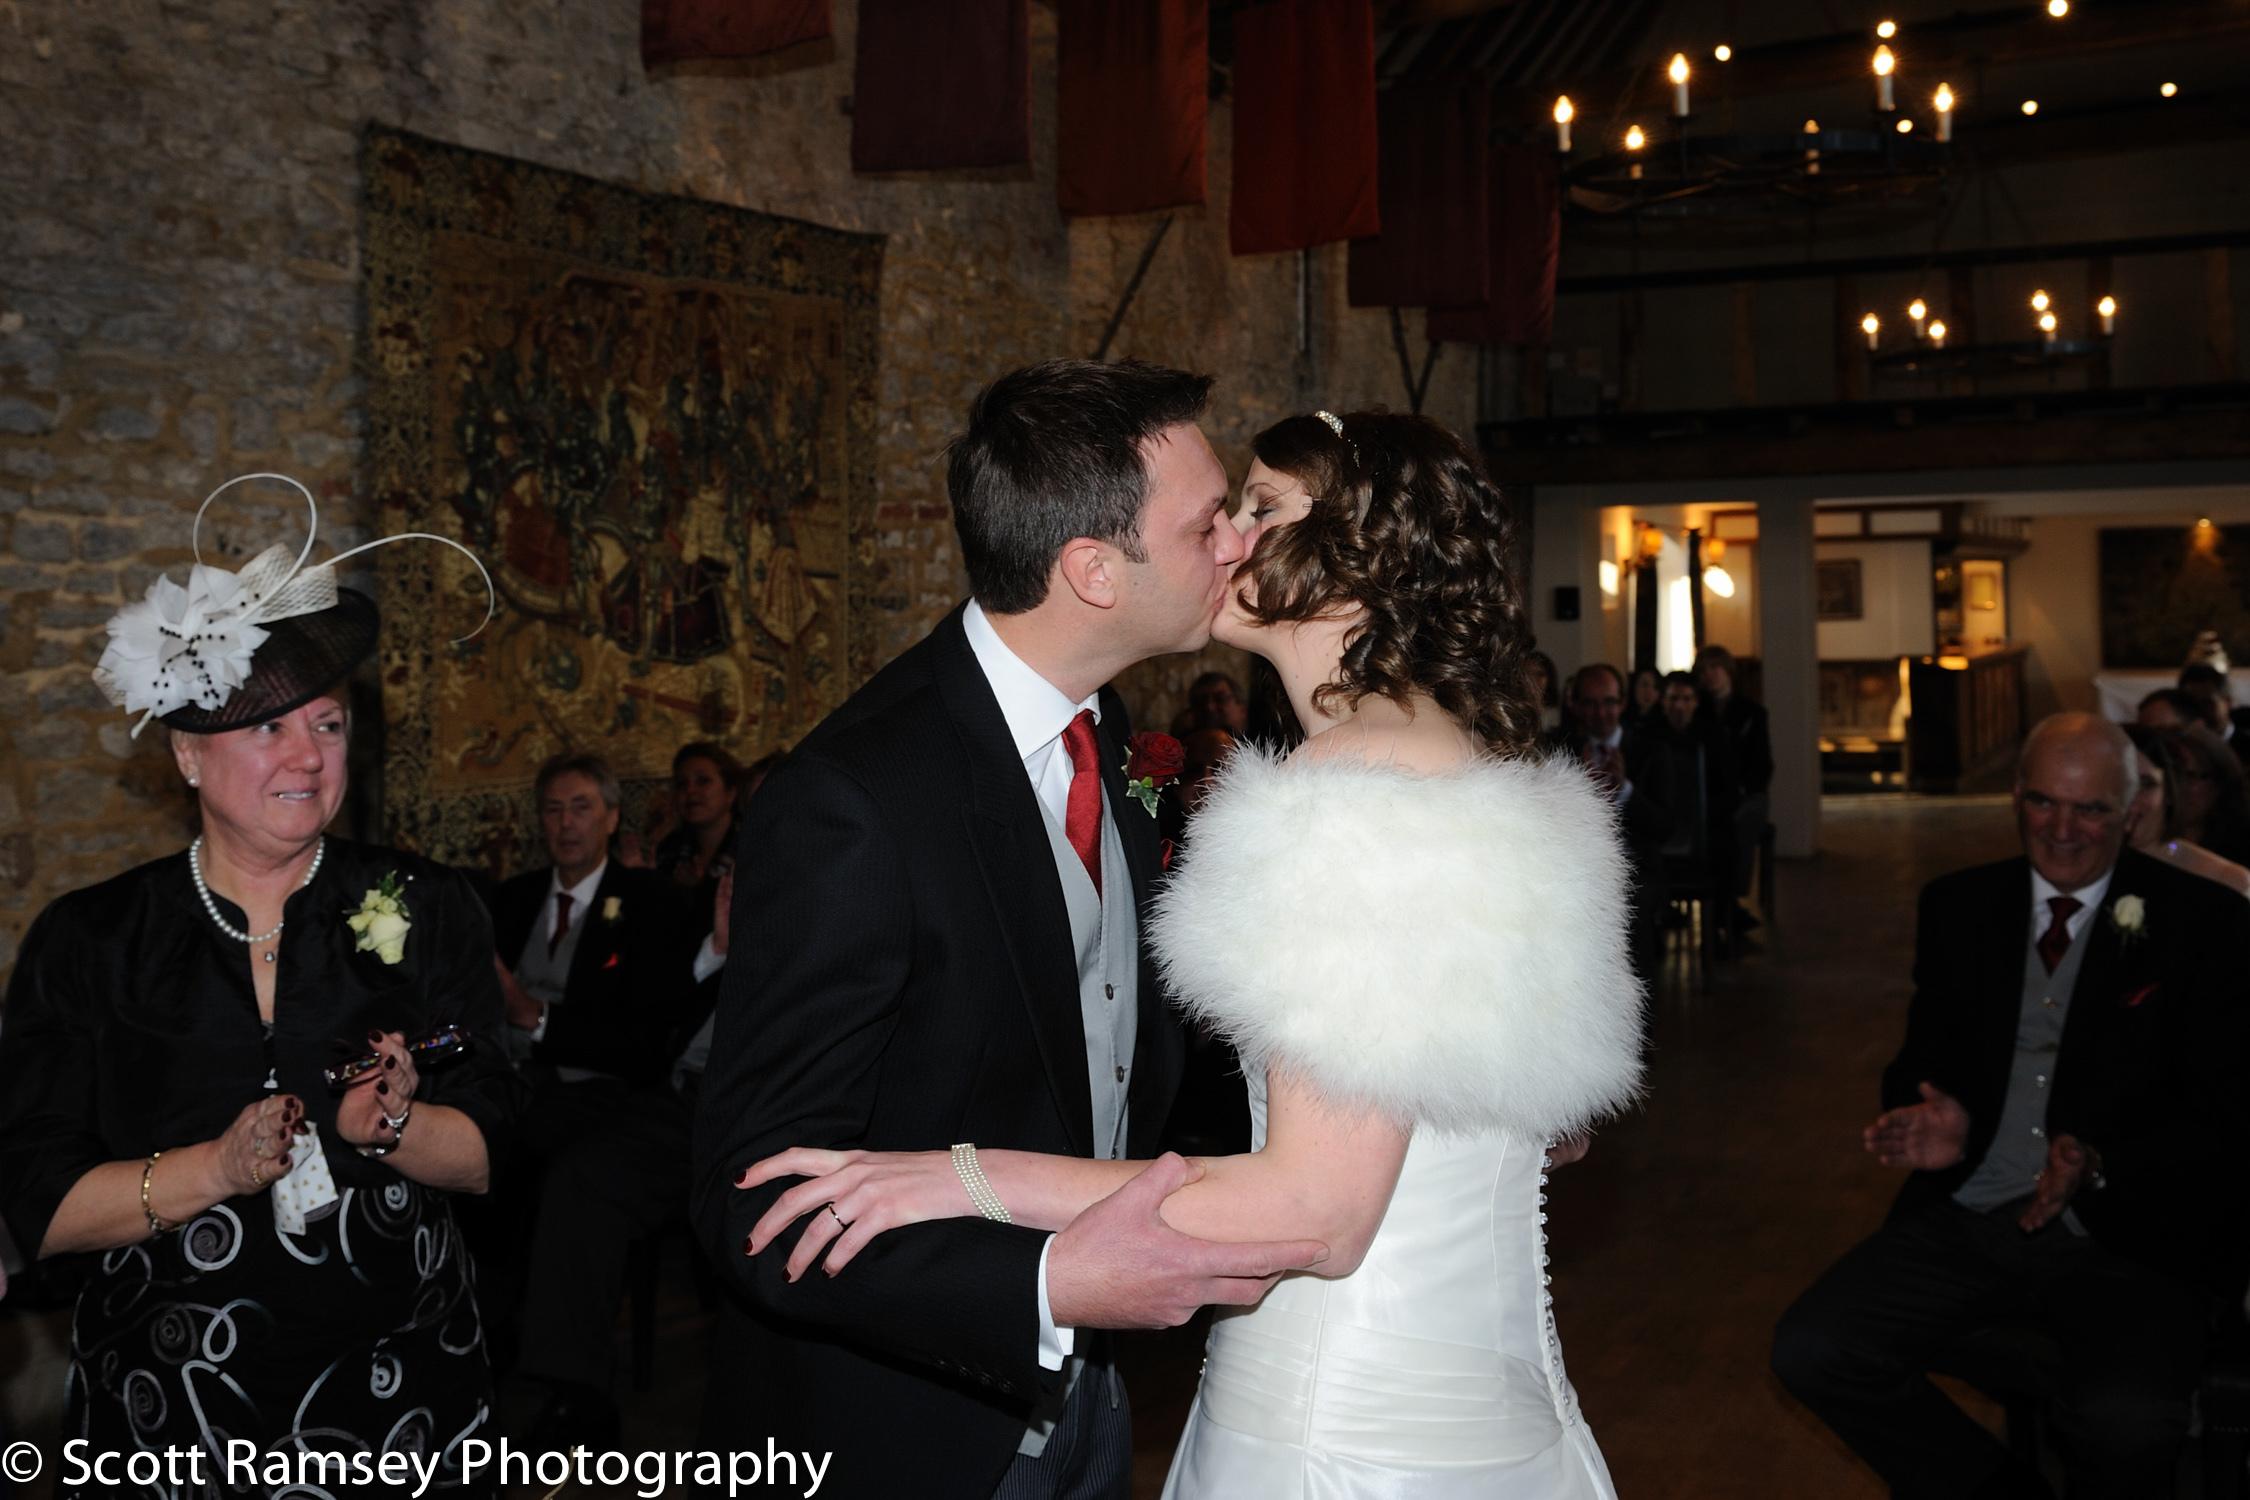 Winter-Wedding-Spread-Eagle-Hotel-Midhurst-Groom-Bride-Kiss-0312